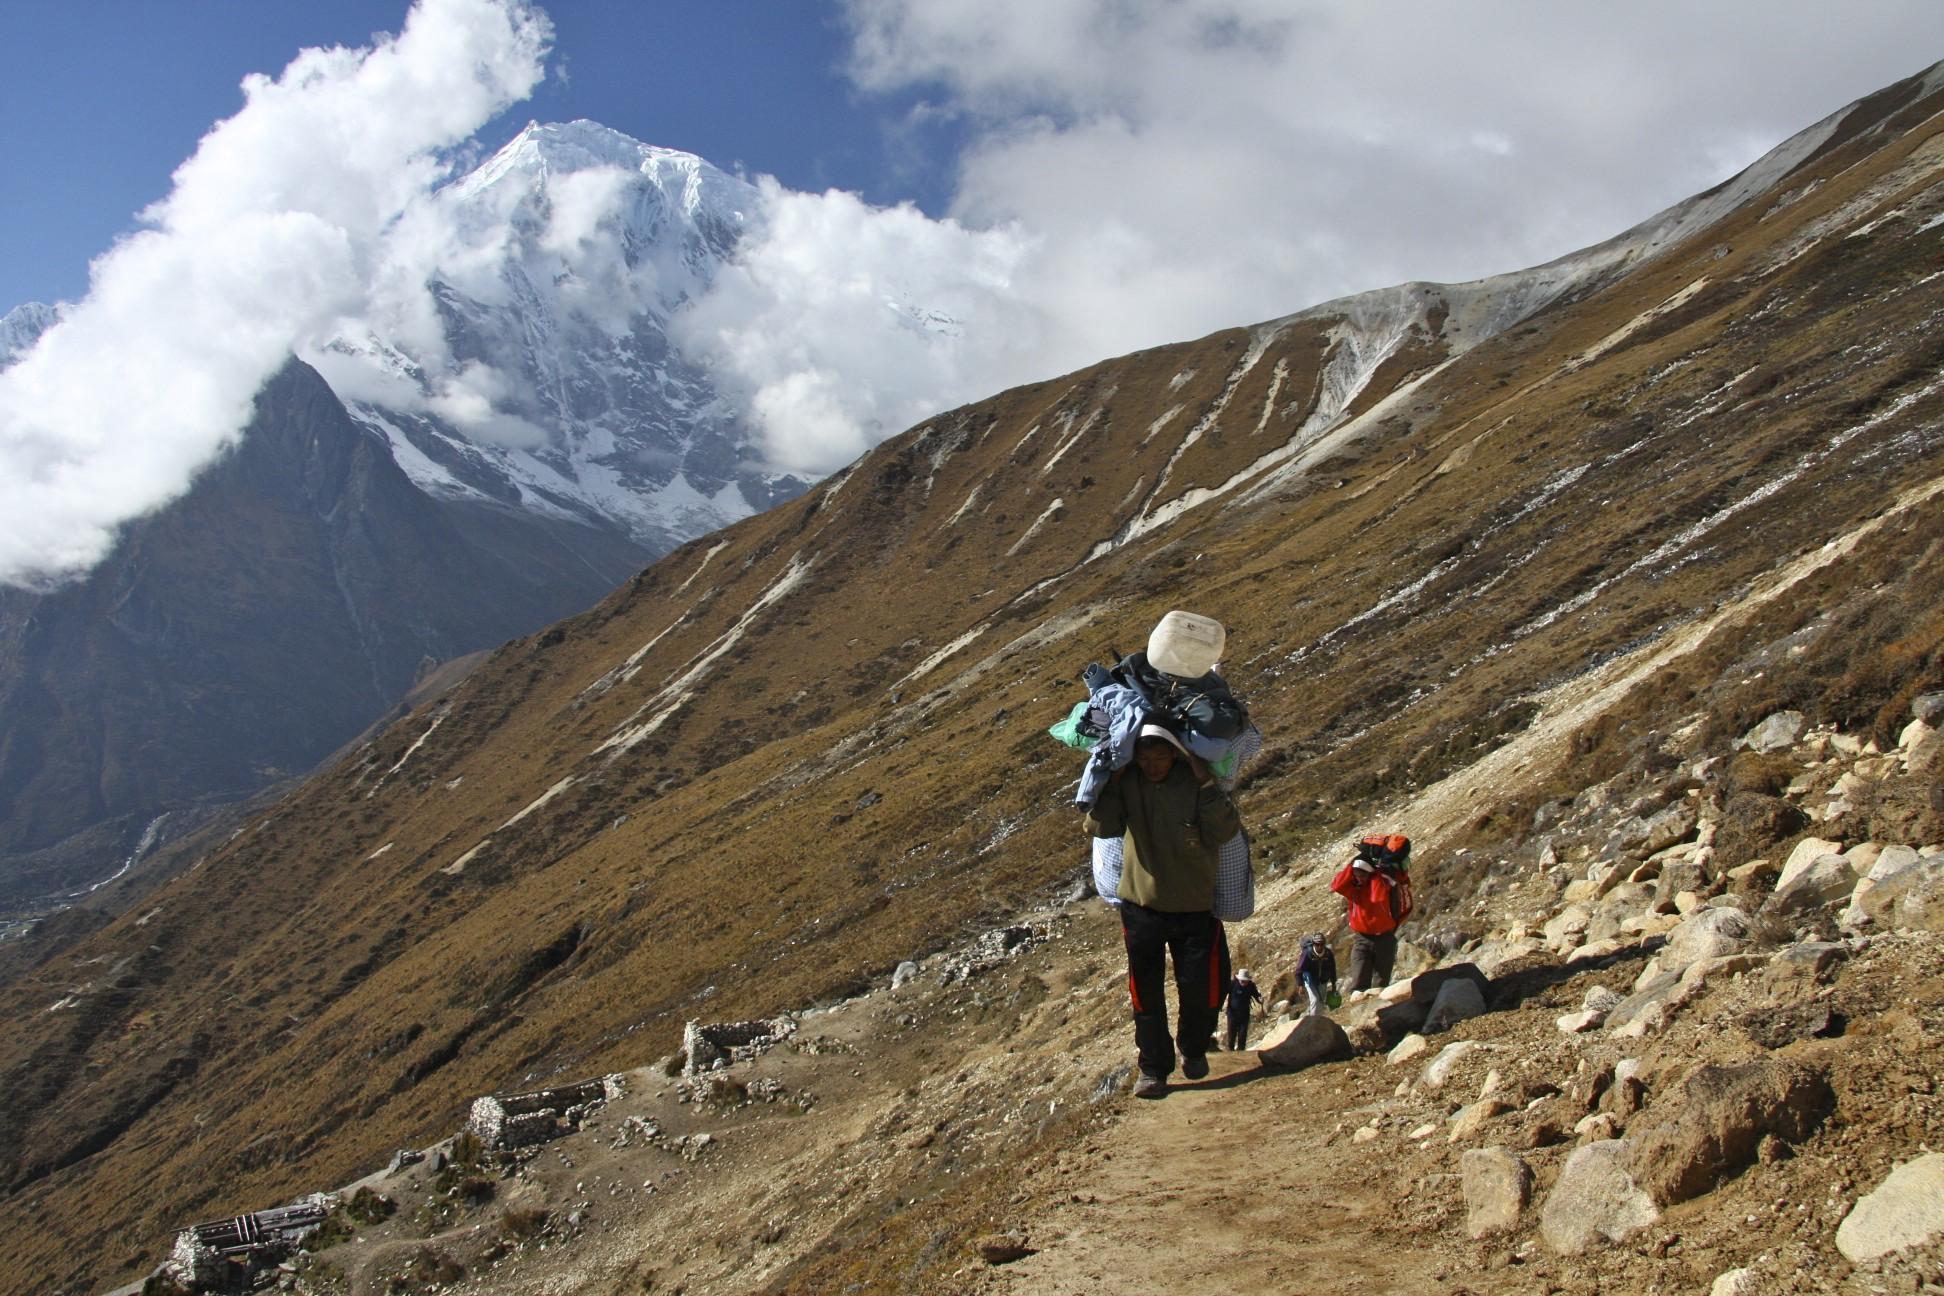 Approach to Yala Peak